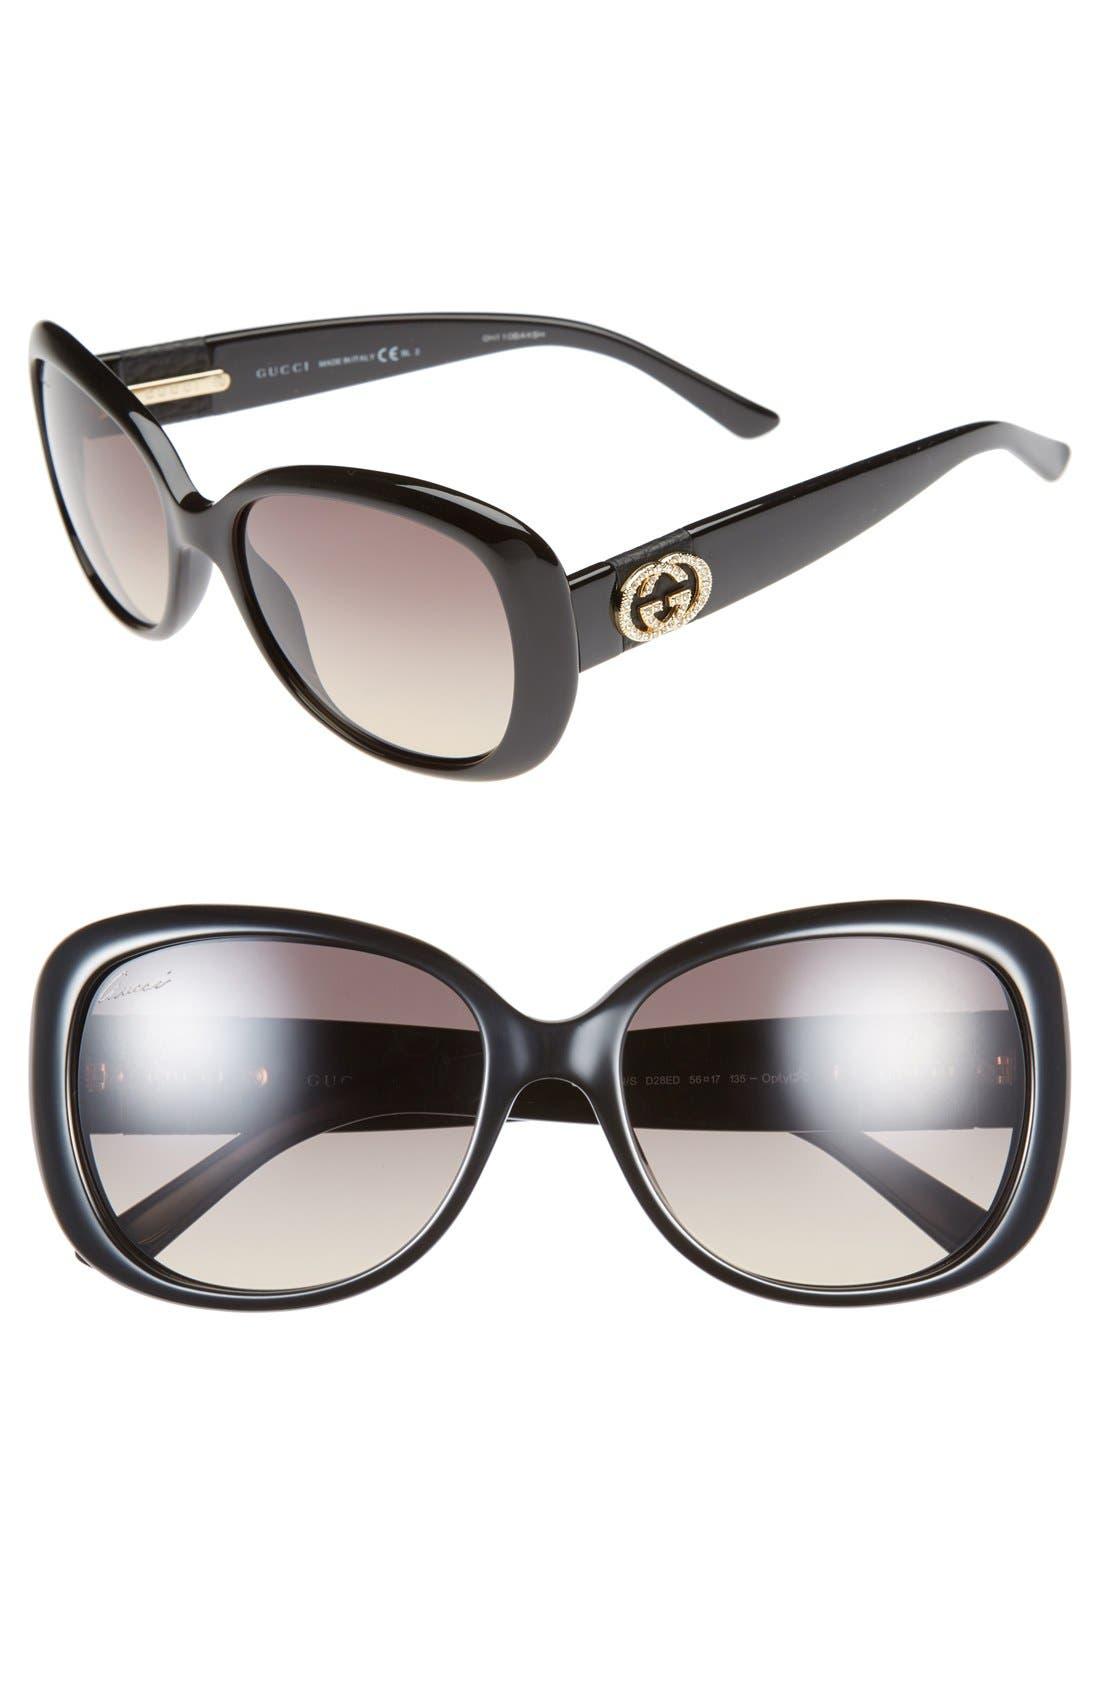 56mm Swarovski Crystal Sunglasses,                             Main thumbnail 1, color,                             001